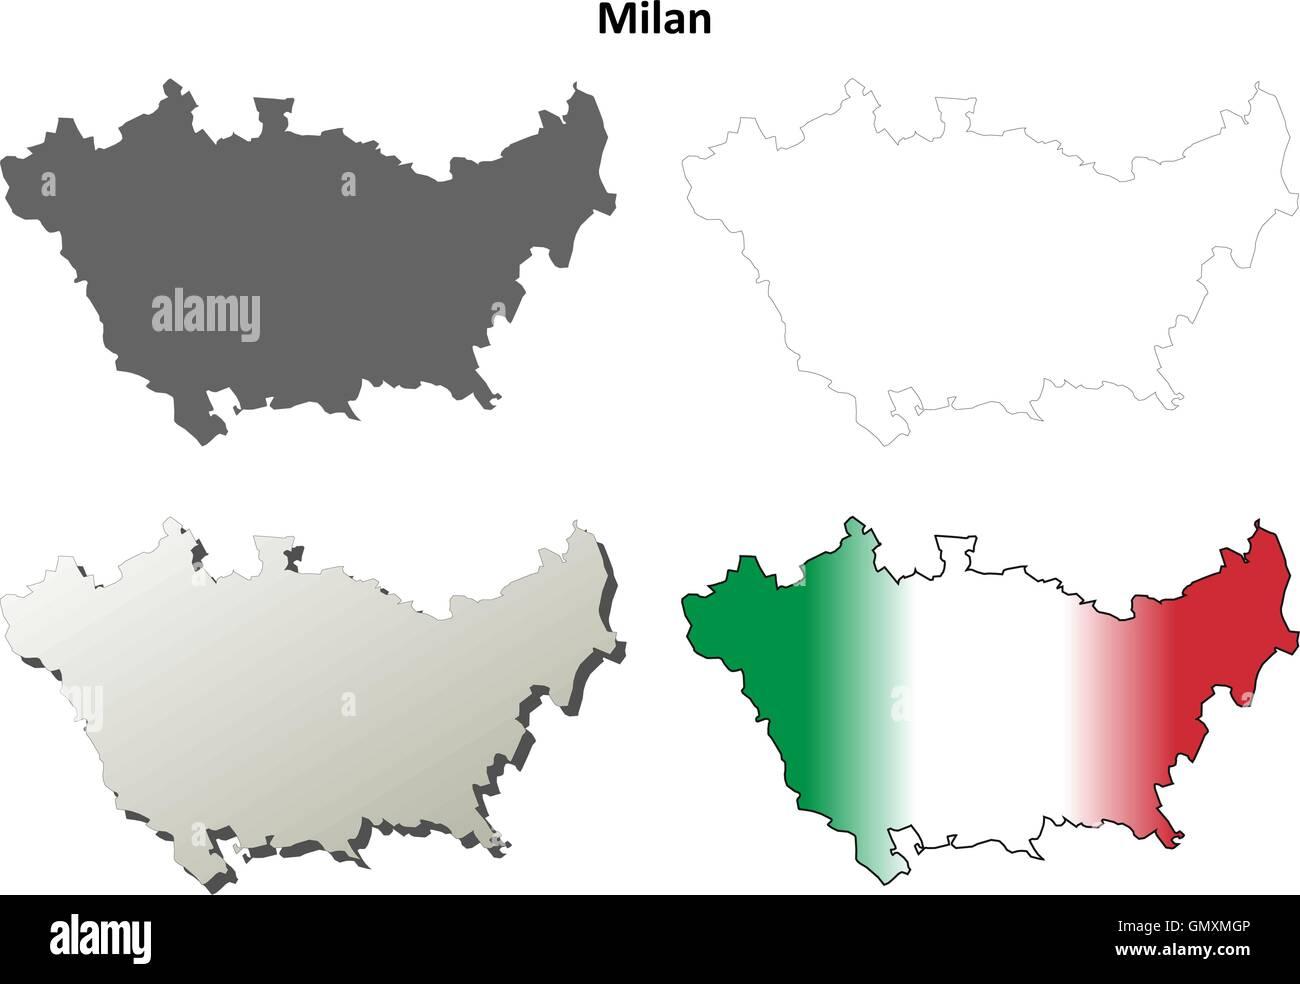 Milan blank detailed outline map set - Stock Vector